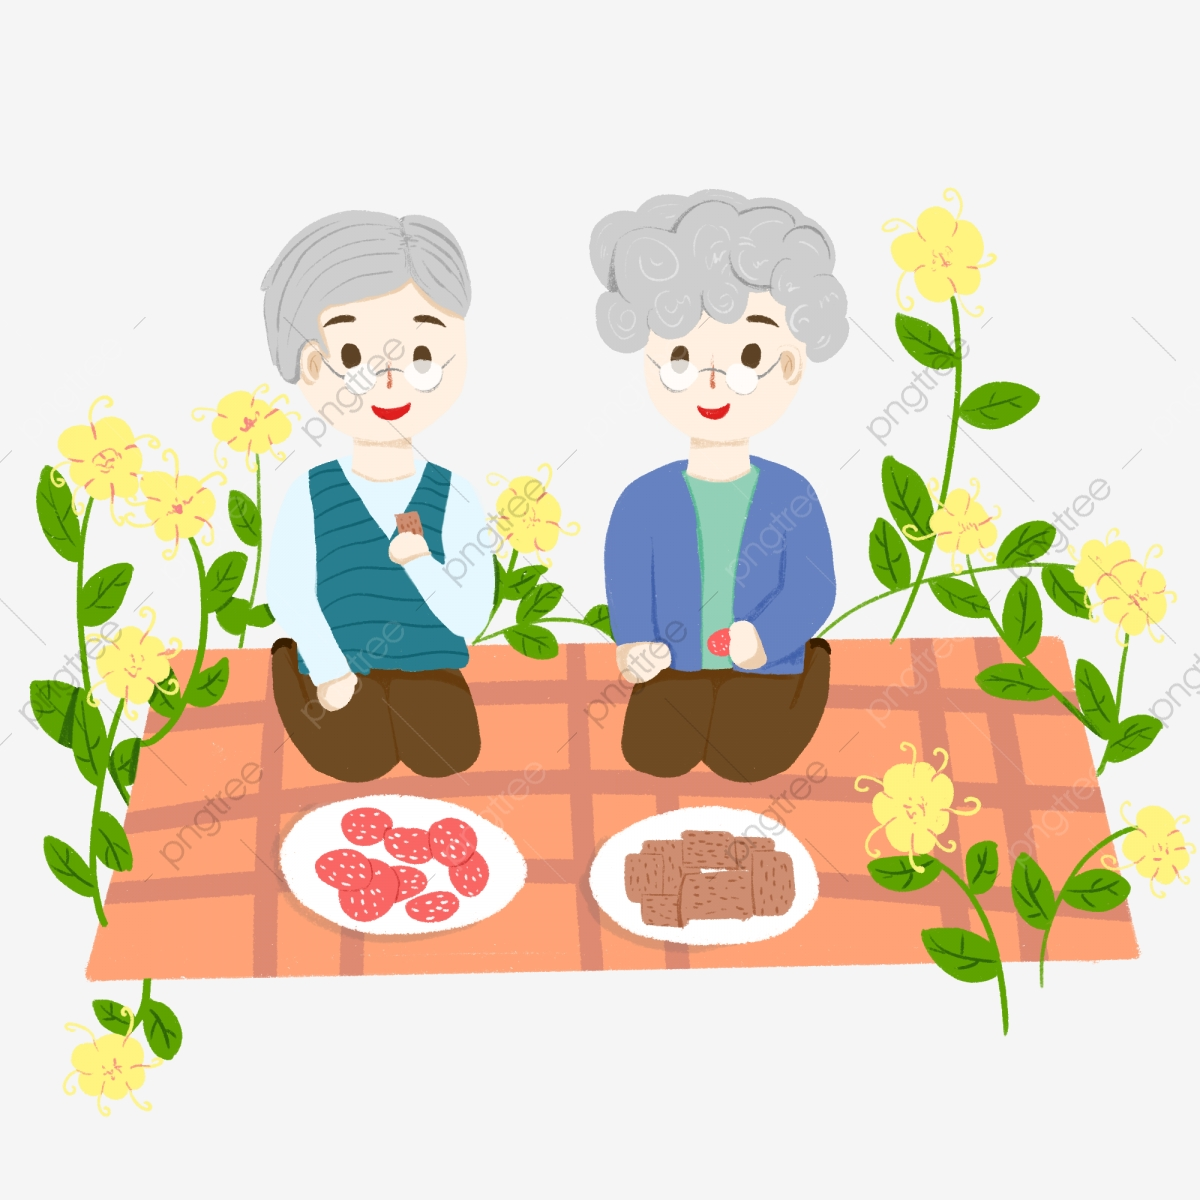 png black and white Double ninth festival grandparents. Grandparent clipart picnic